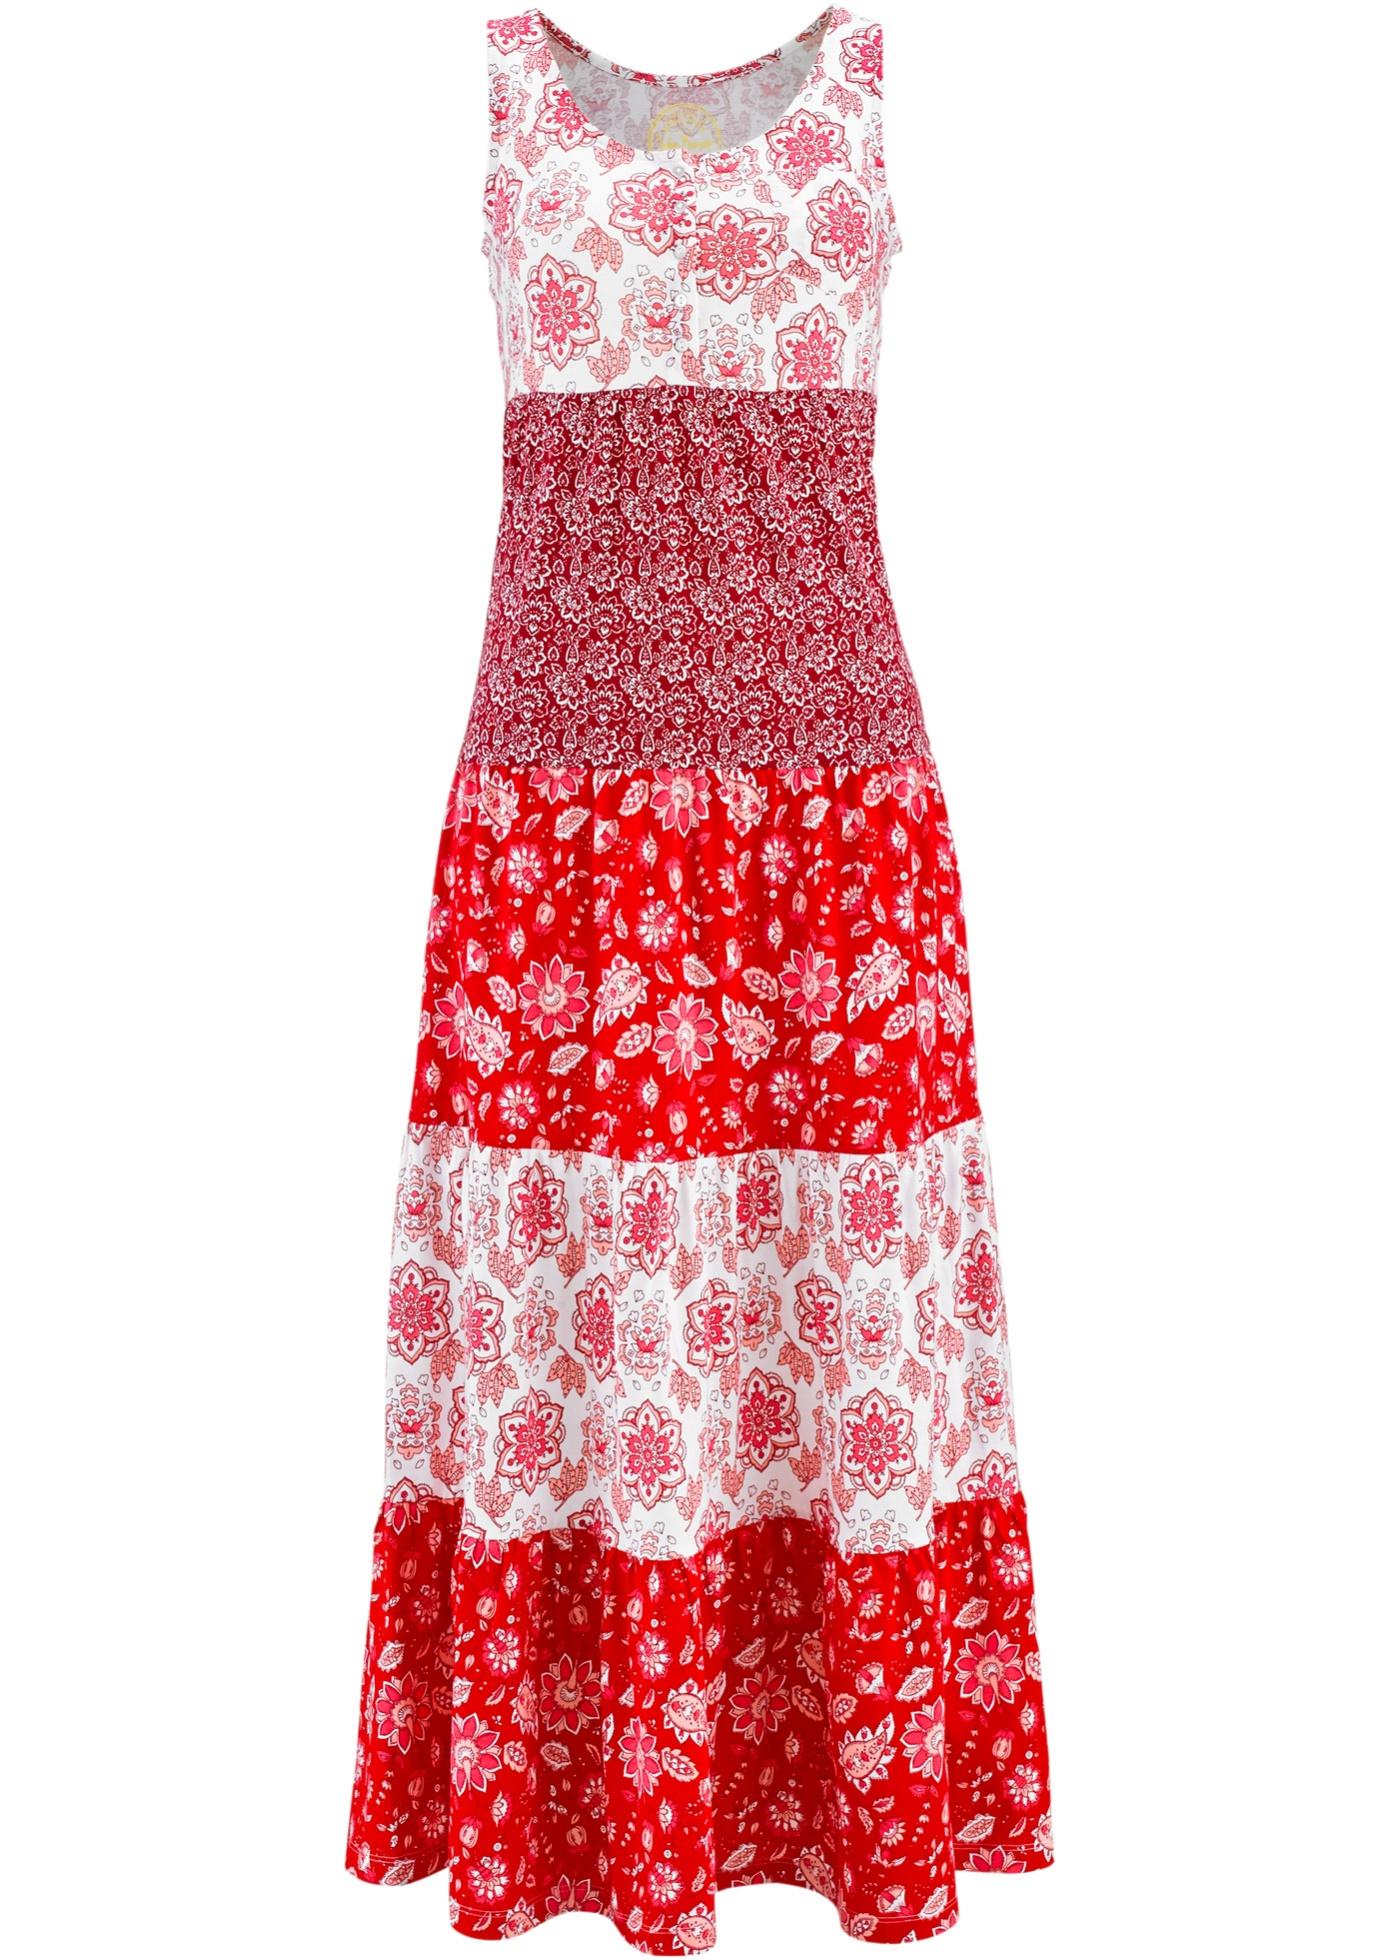 Baumwoll Jerseykleid, lang